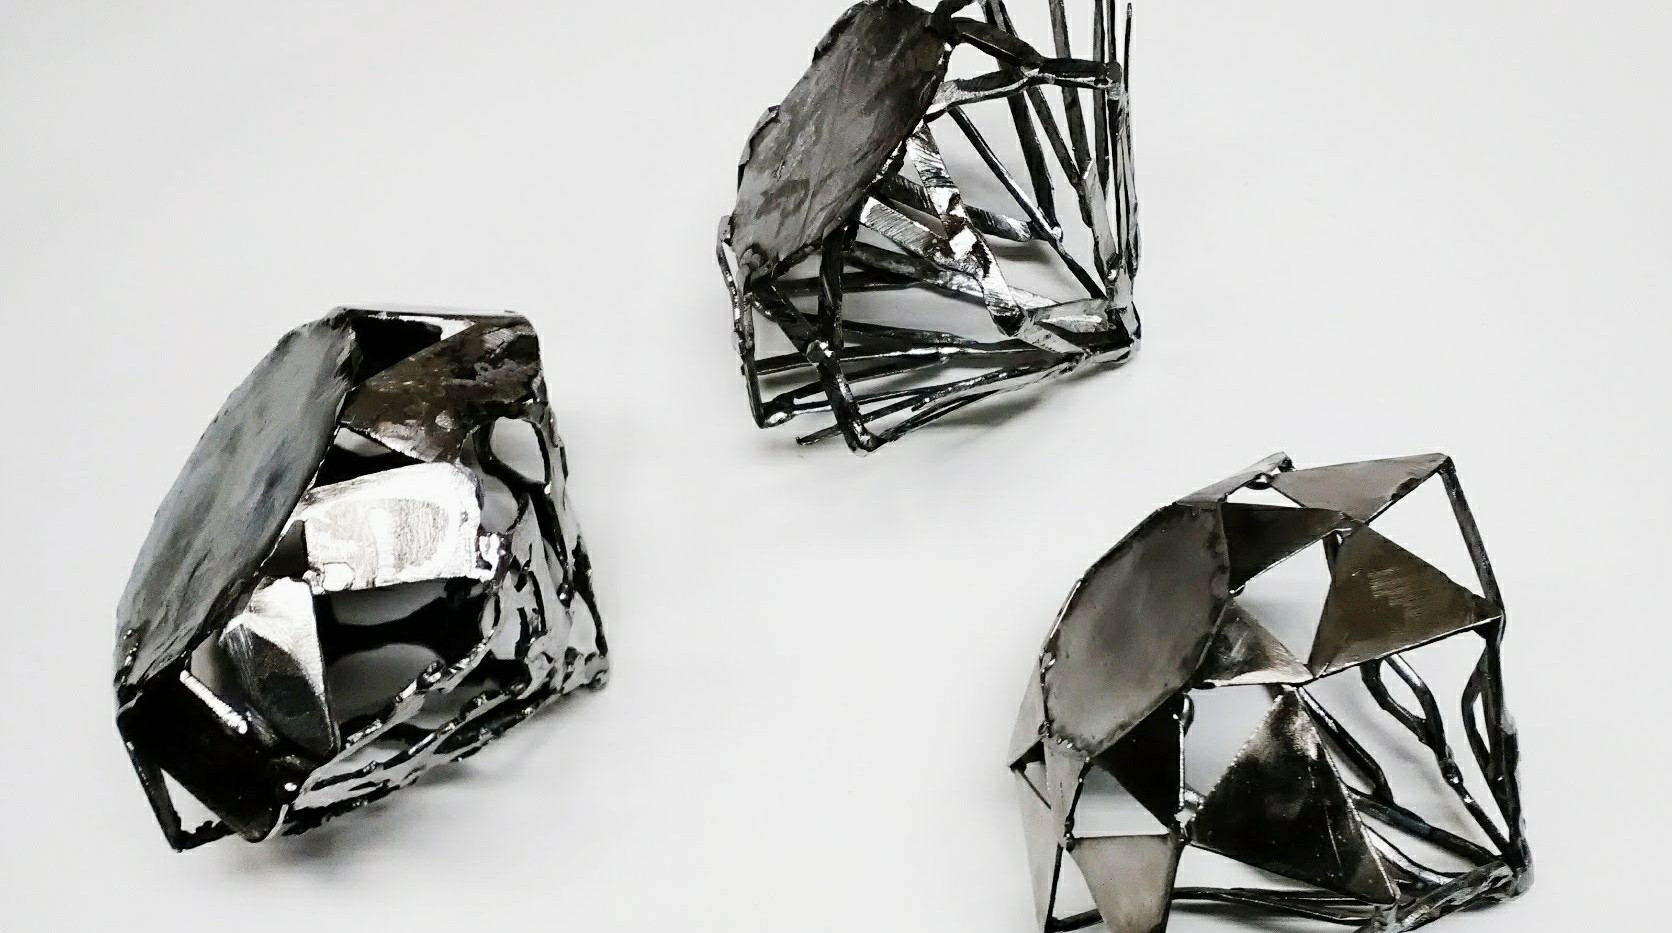 Diamond in the rough_welding steel